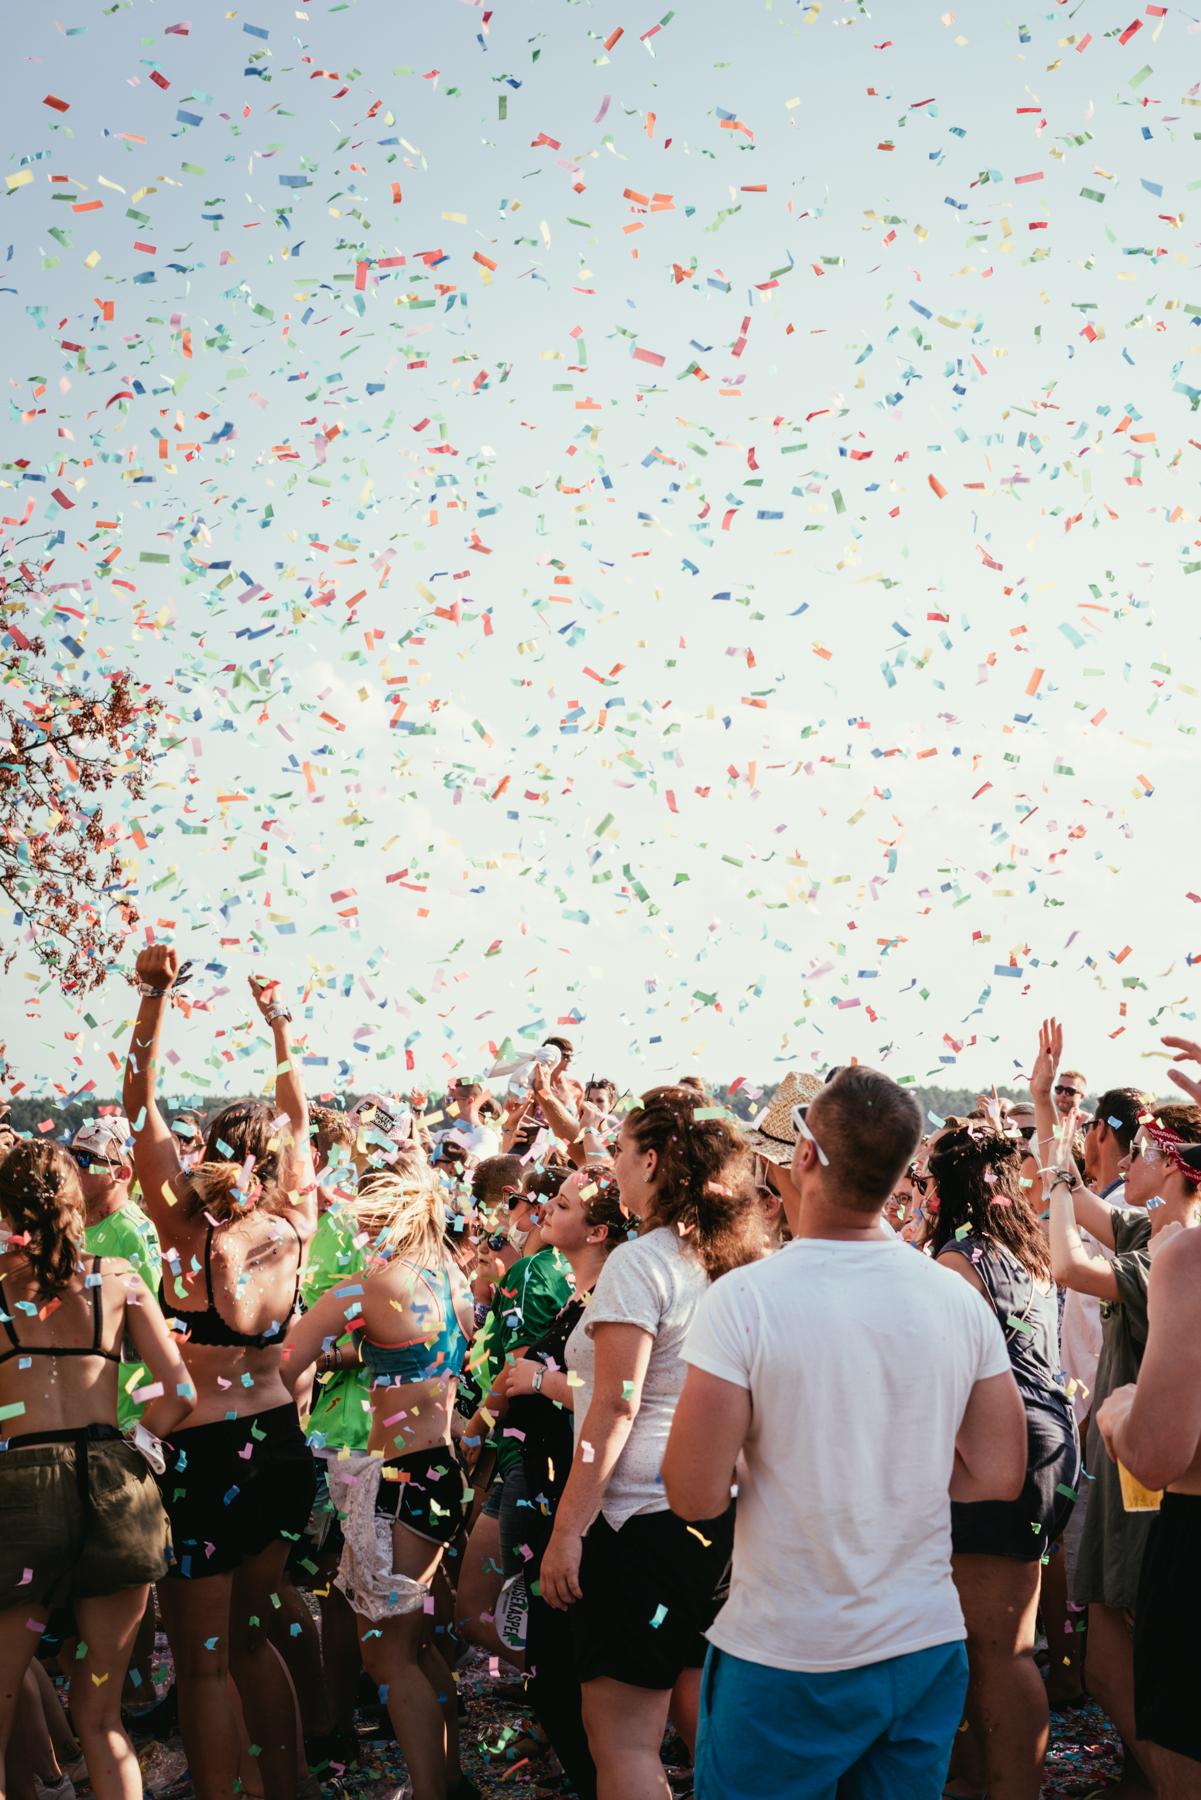 28-07-2018 Helene Beach Festival_Impressions-17